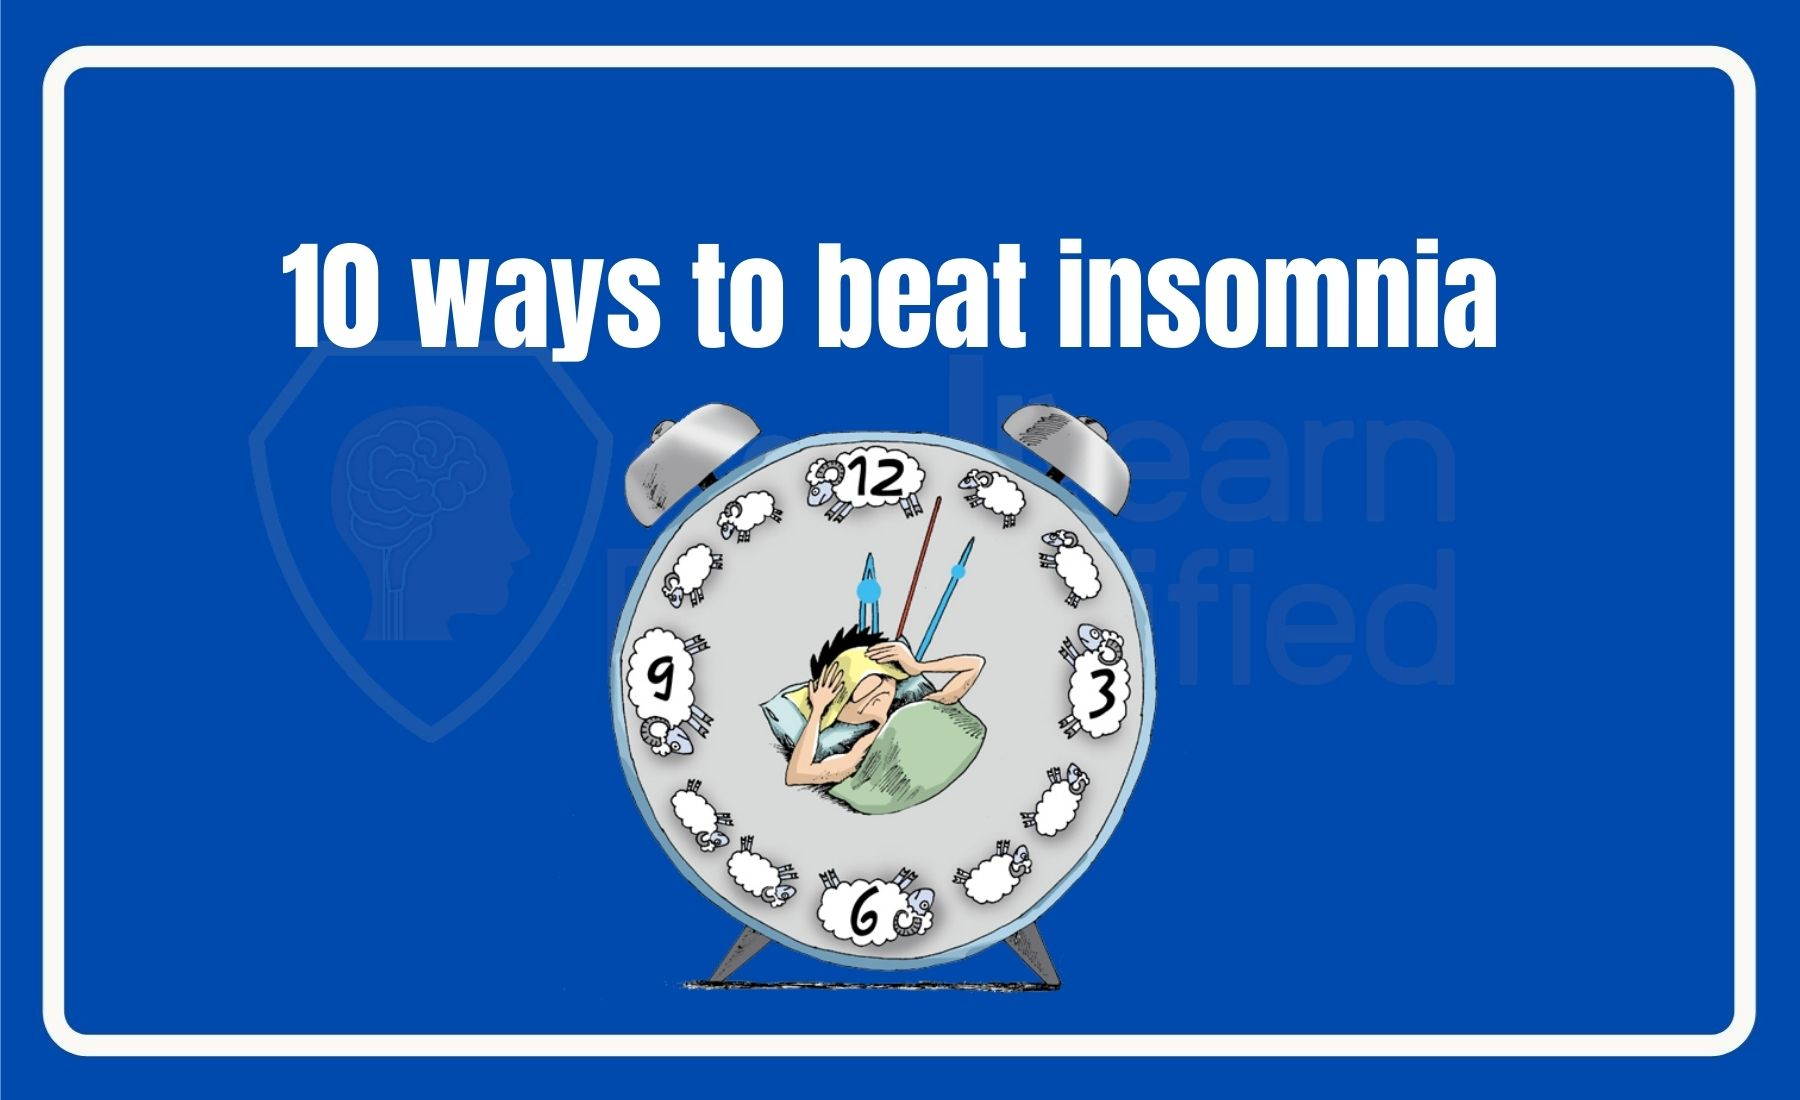 10 ways to beat insomnia